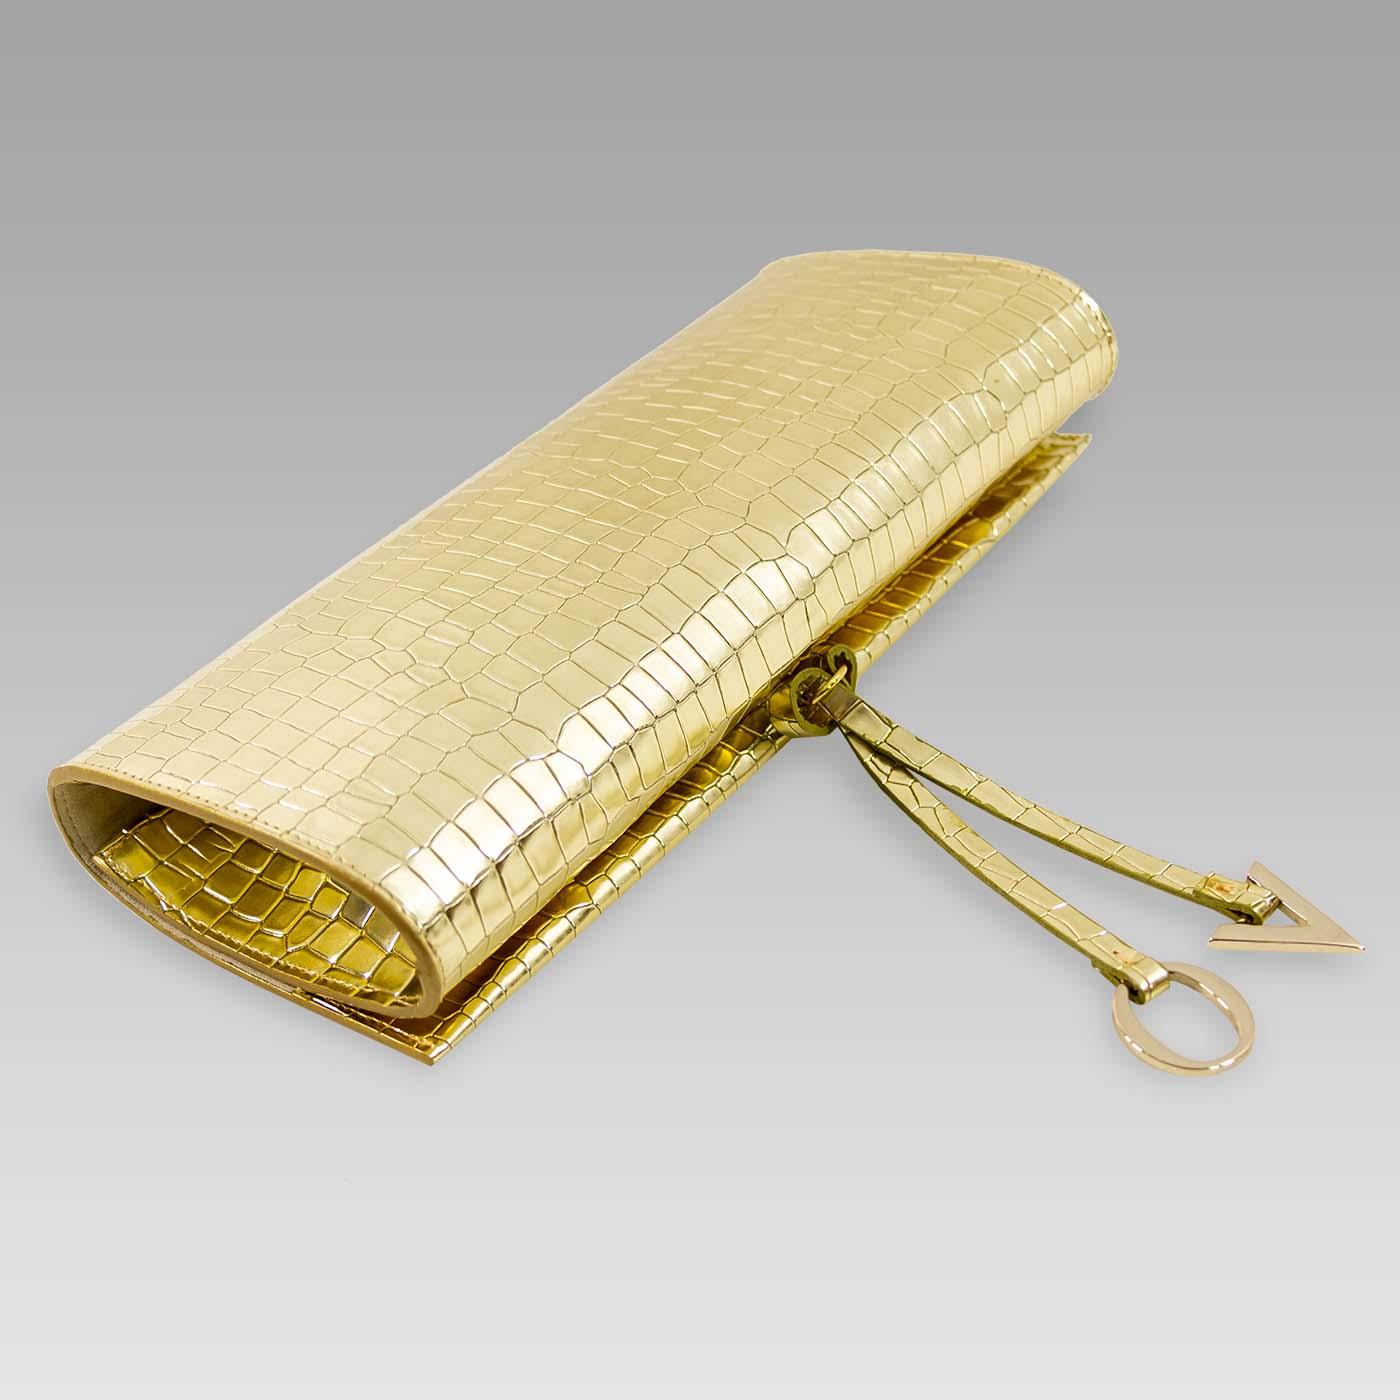 Valentino_Orlandi_Envelope_Clutch_Purse_Gold_Croc_Embossed_Leather_Bag_01VO6210CLGL_01.jpg